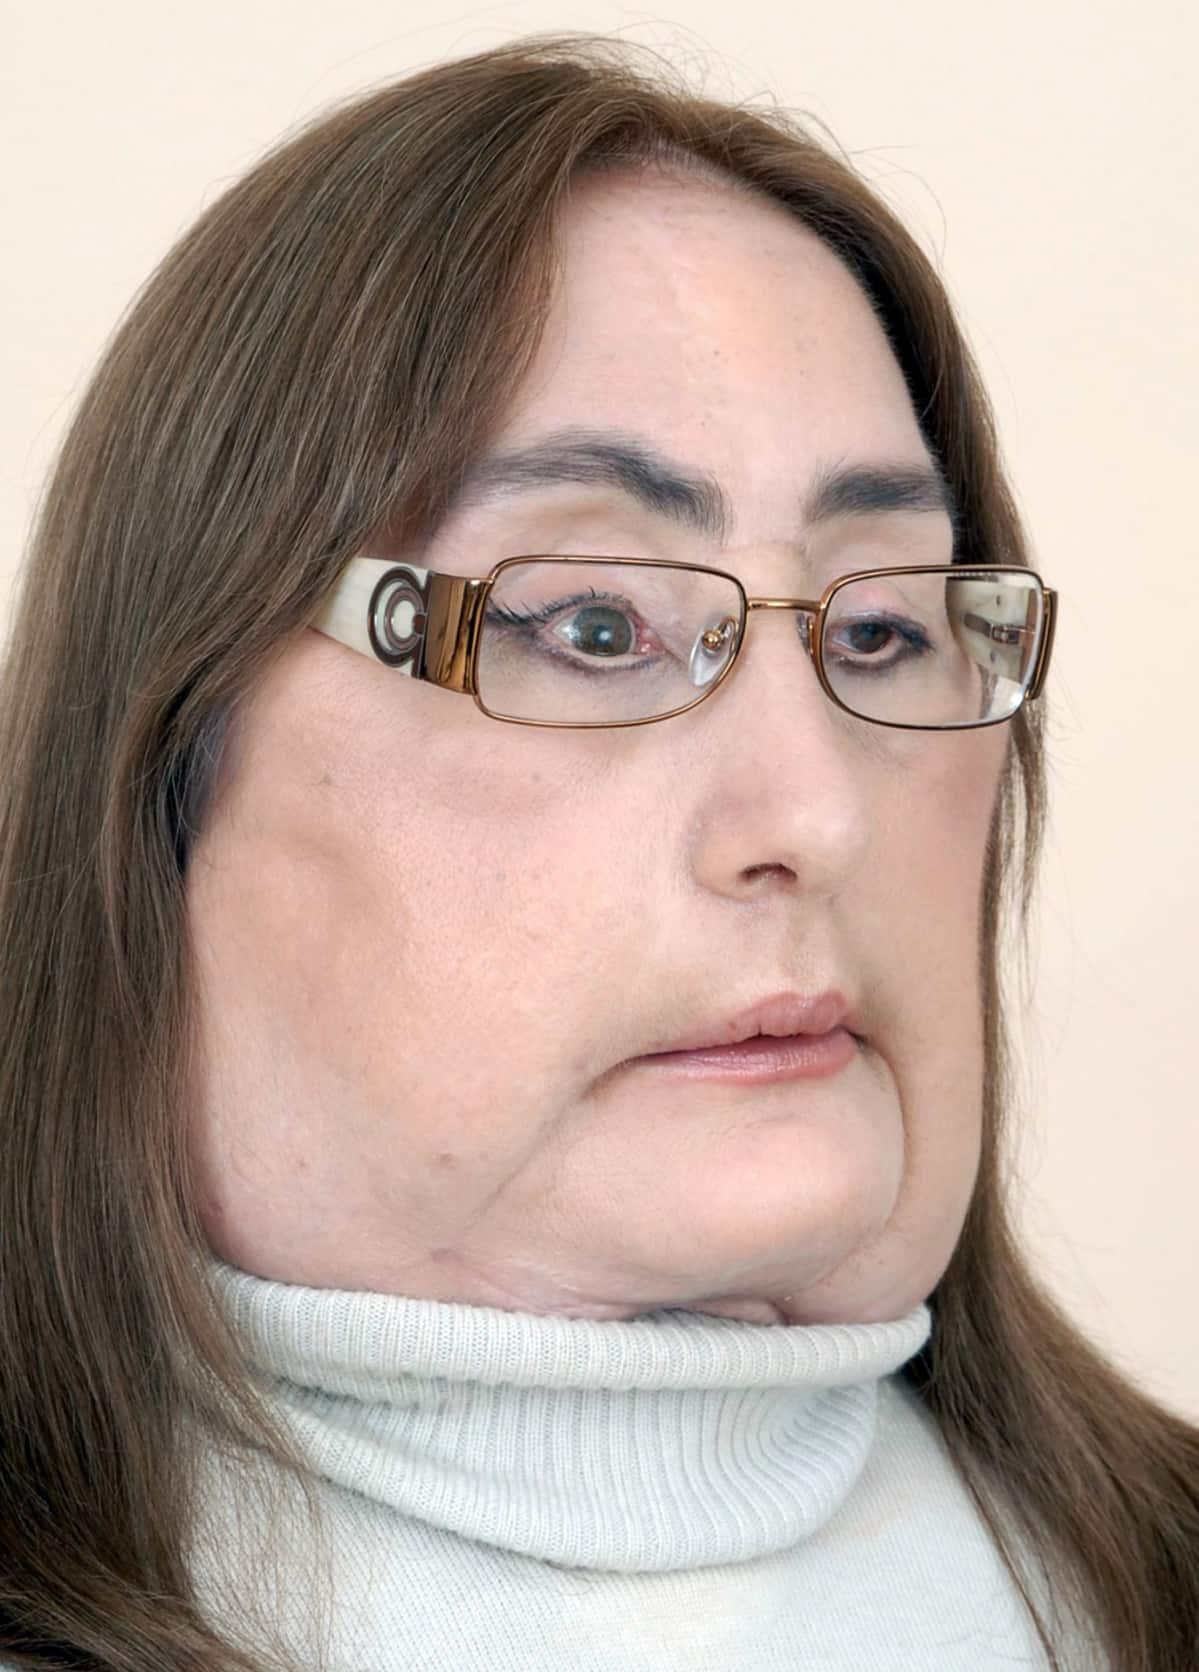 kasvonsiirtopotilas